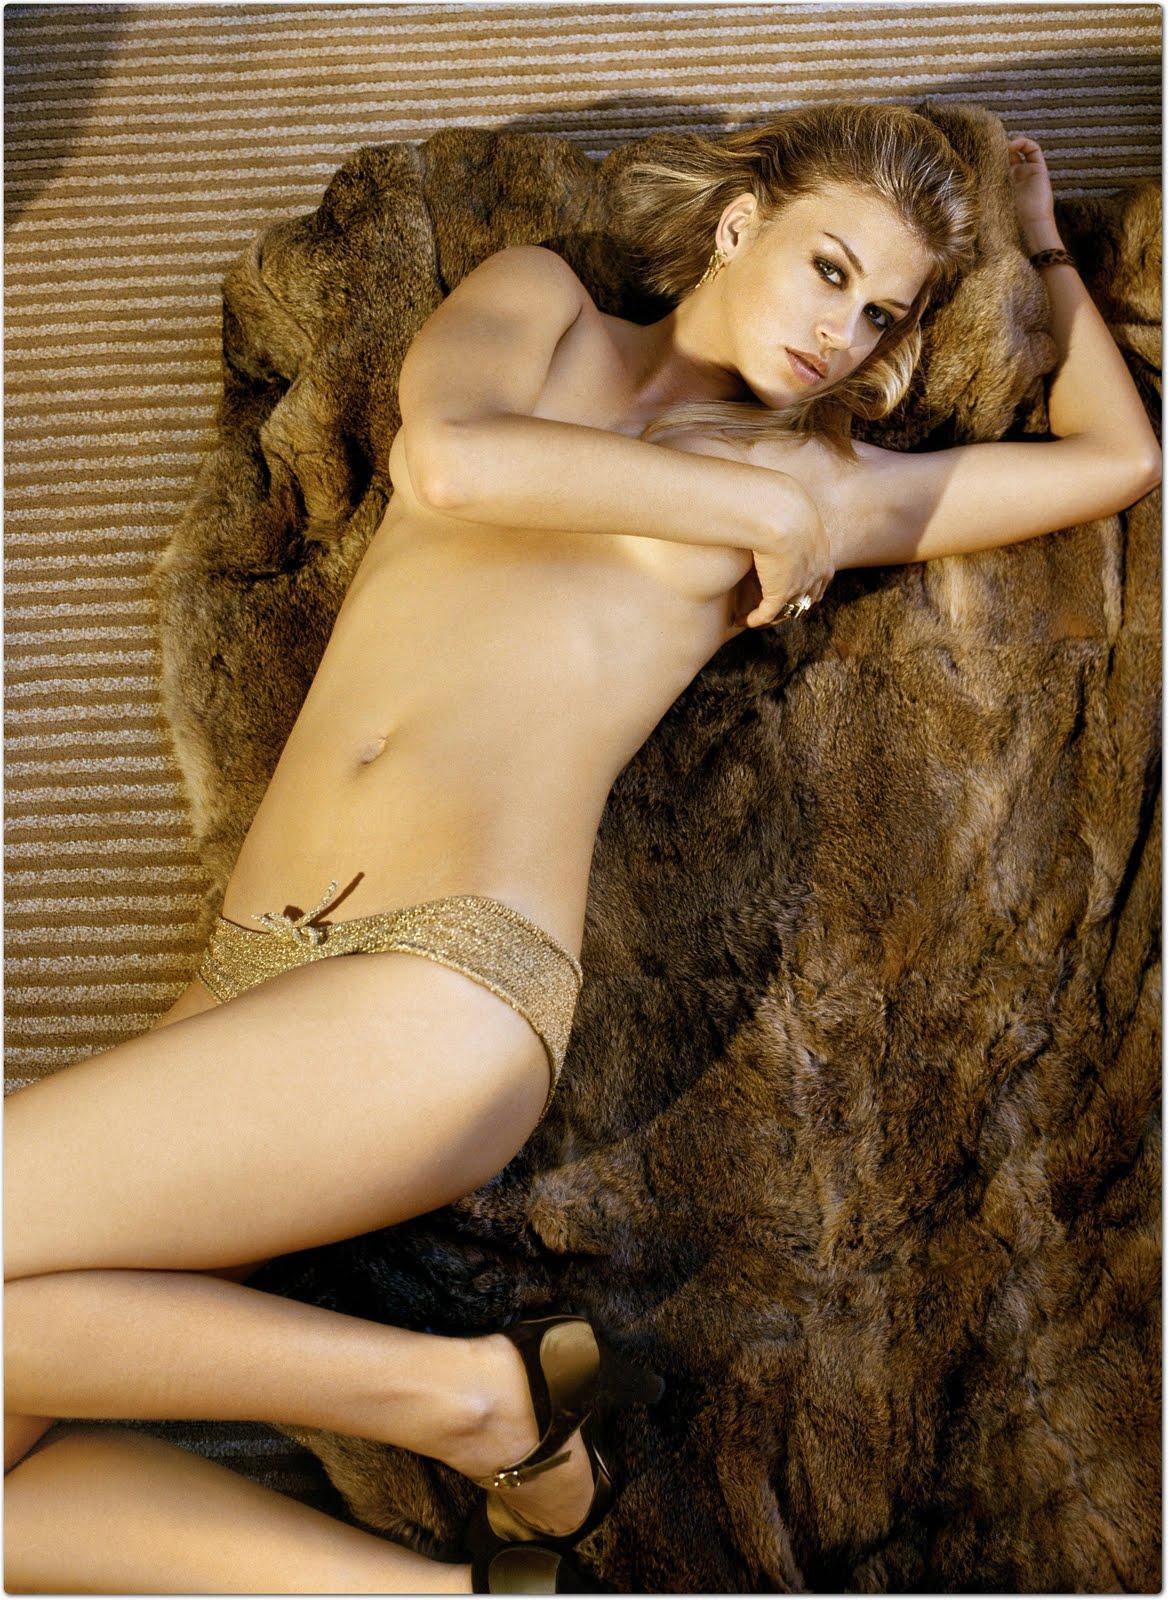 http://2.bp.blogspot.com/_gdq4UJnJW5E/S-J9SfcUXiI/AAAAAAAABzQ/nA_0NLiMapM/s1600/Adrianne+Palicki+18.jpg